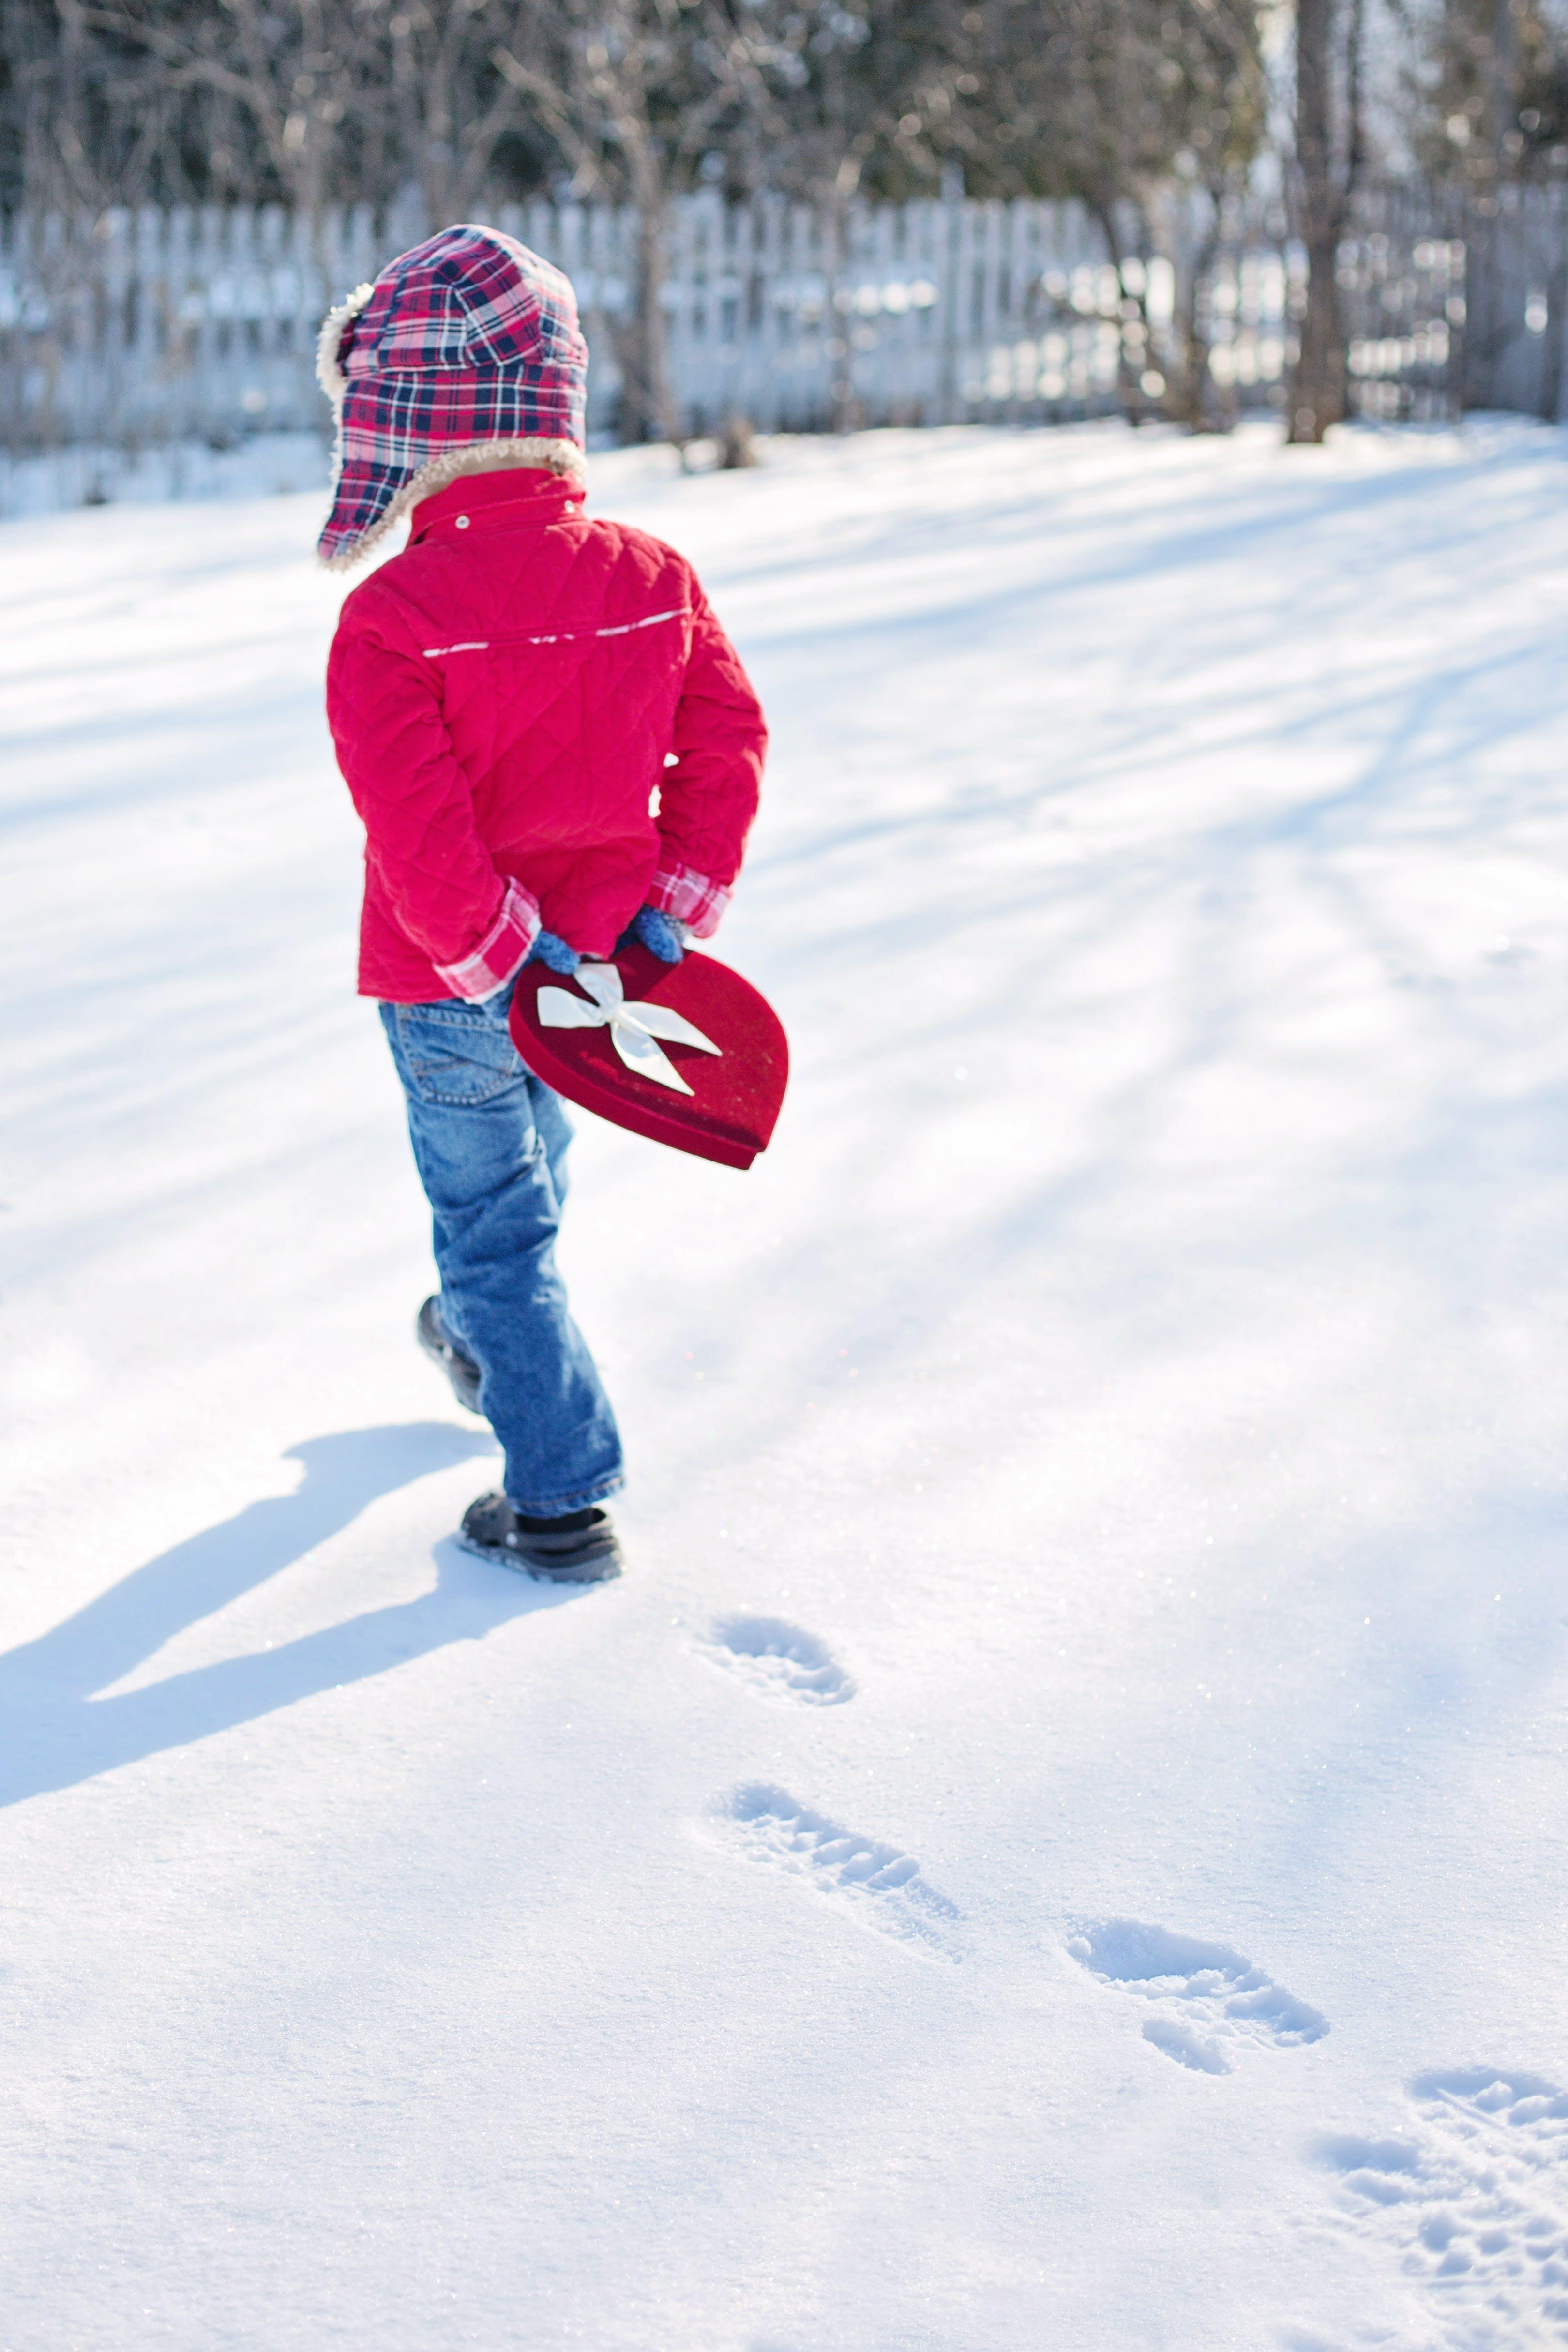 Toddler Walks on Snow